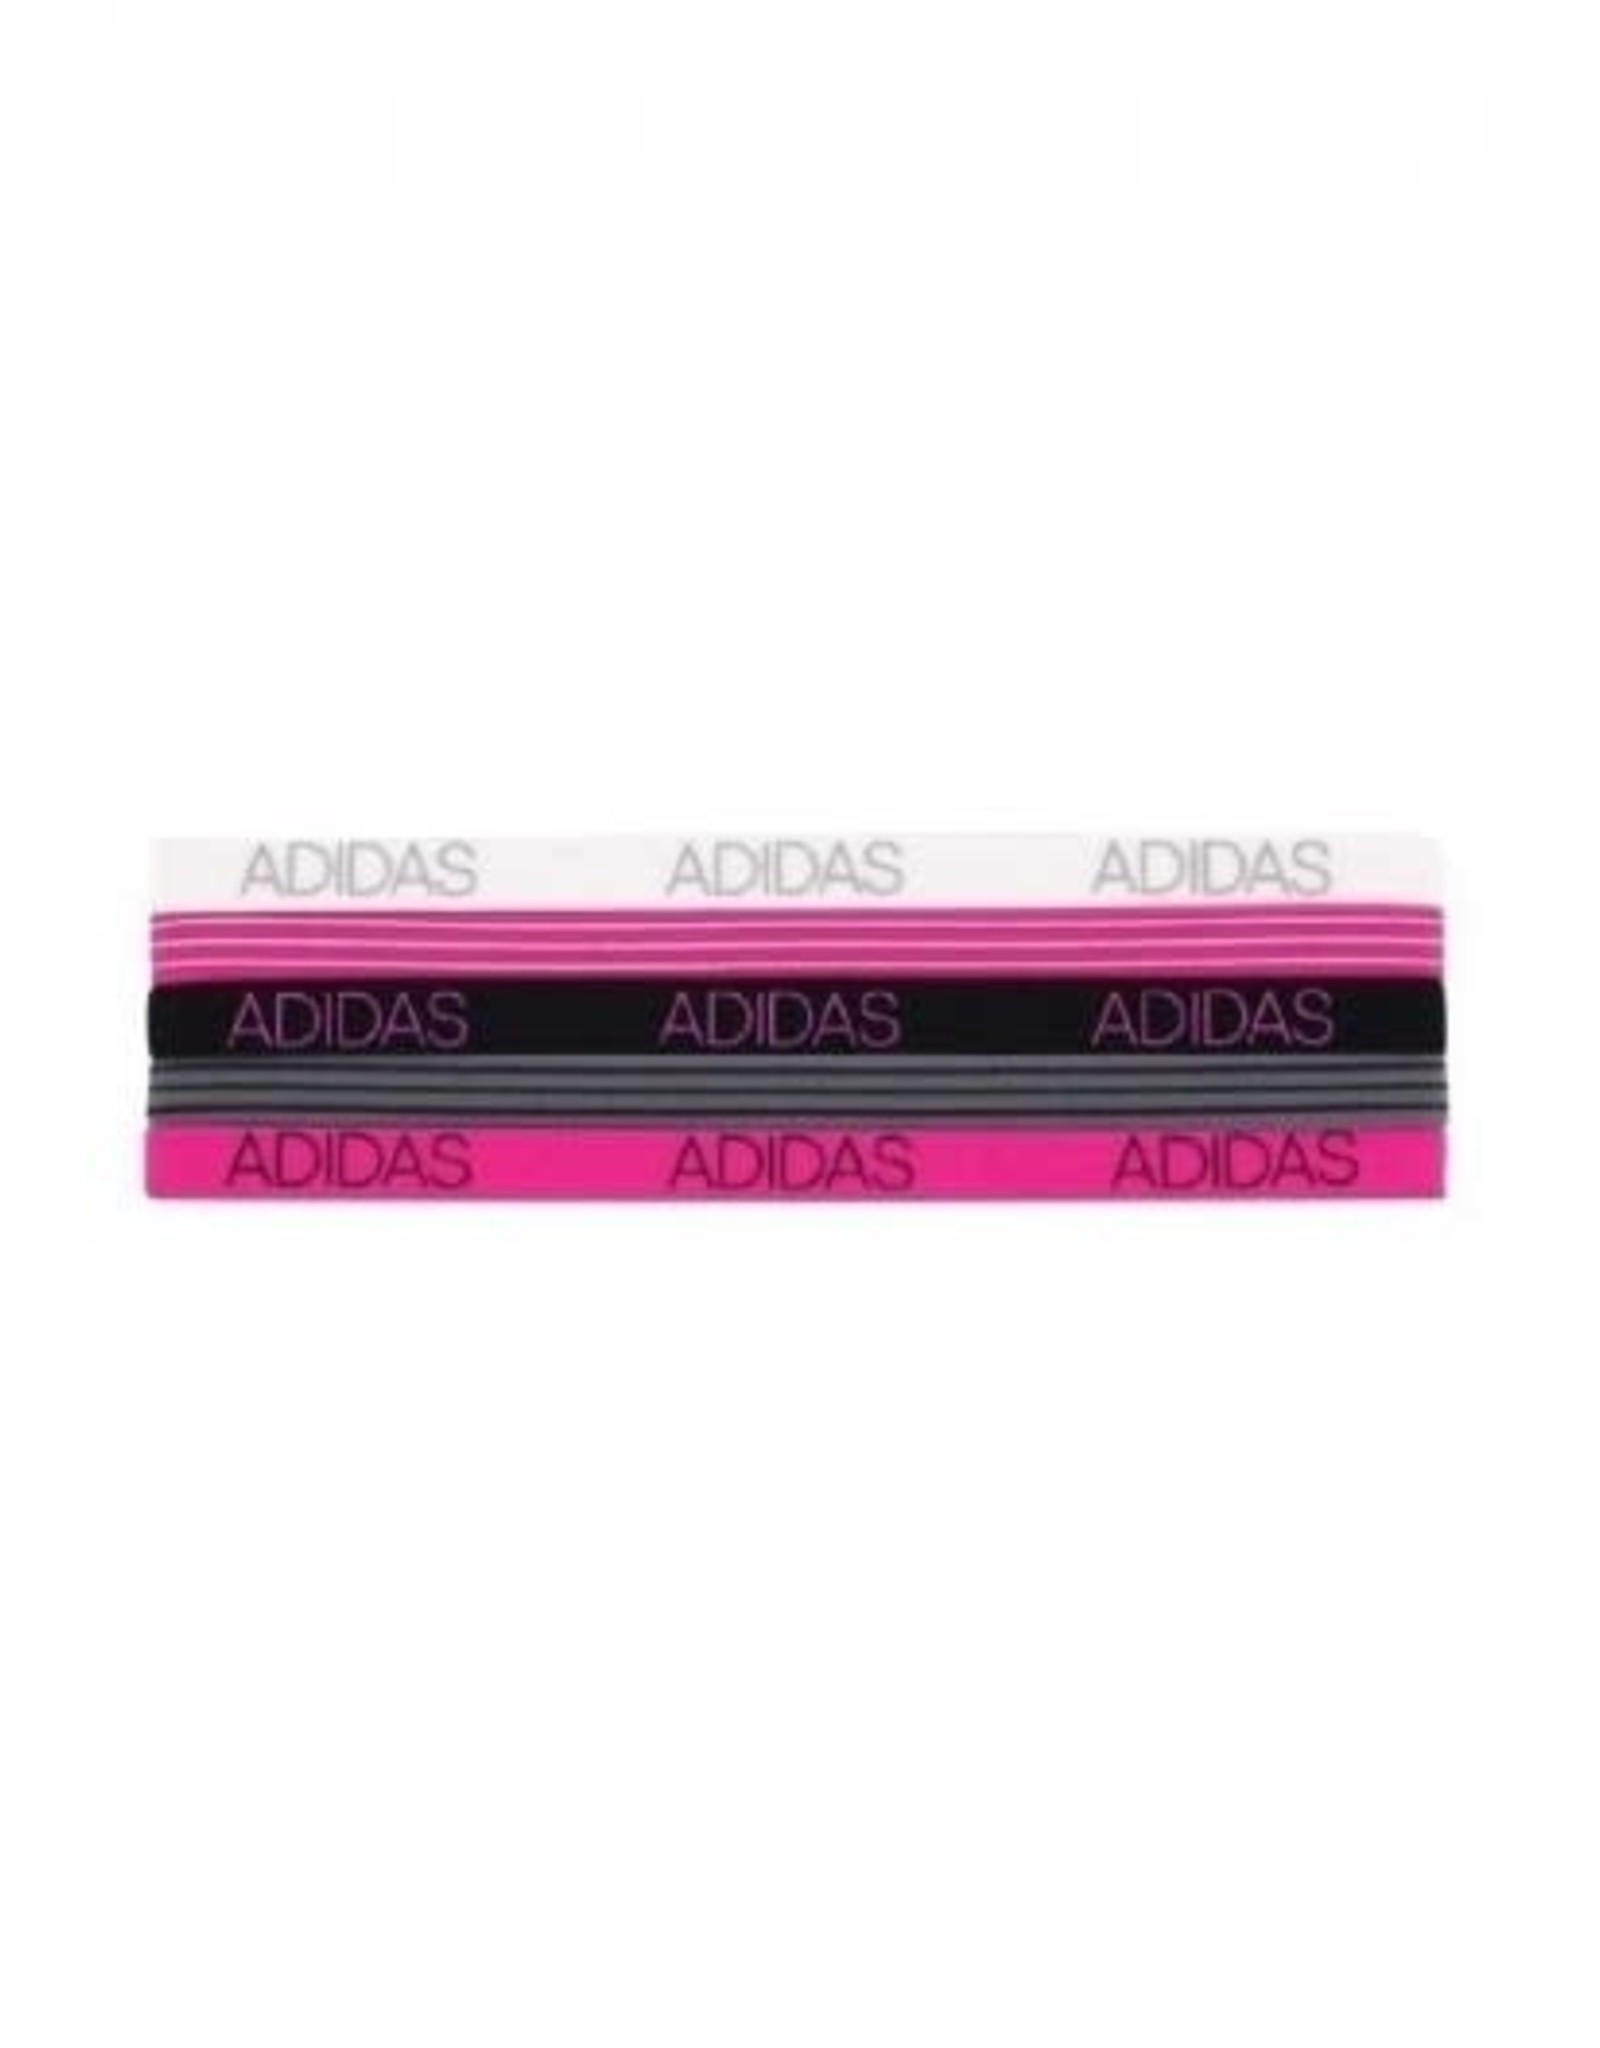 Adidas Adidas Creator Hairbands 5142720